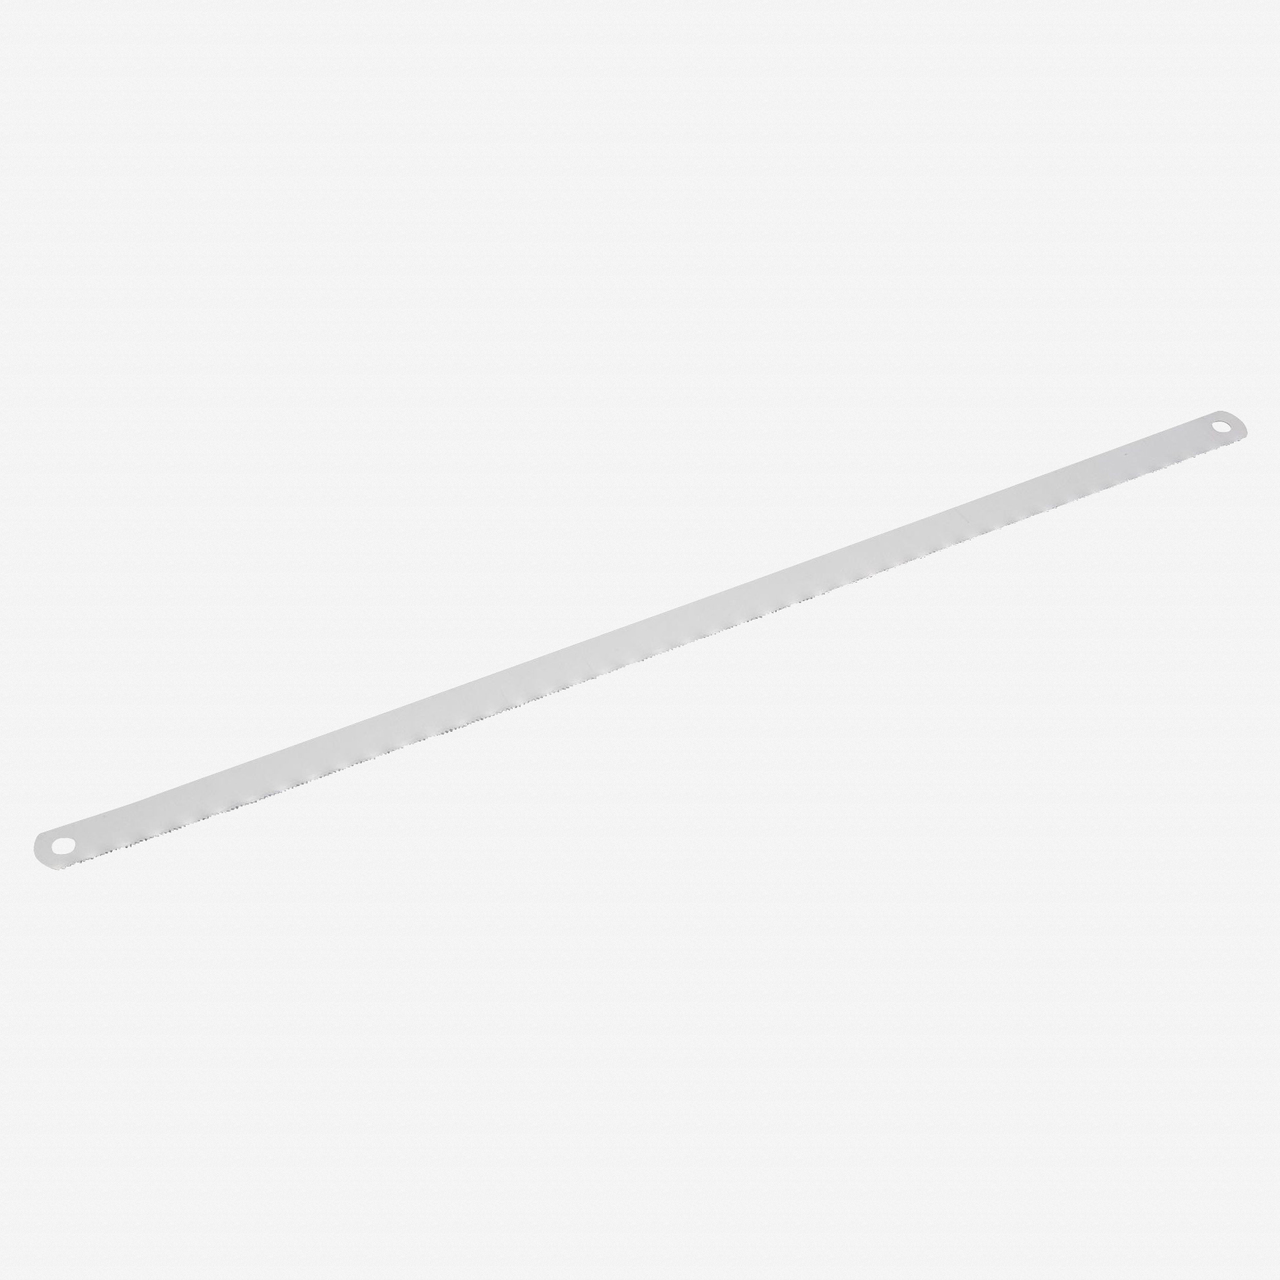 Hazet 1980B-2 Saw blade  - KC Tool